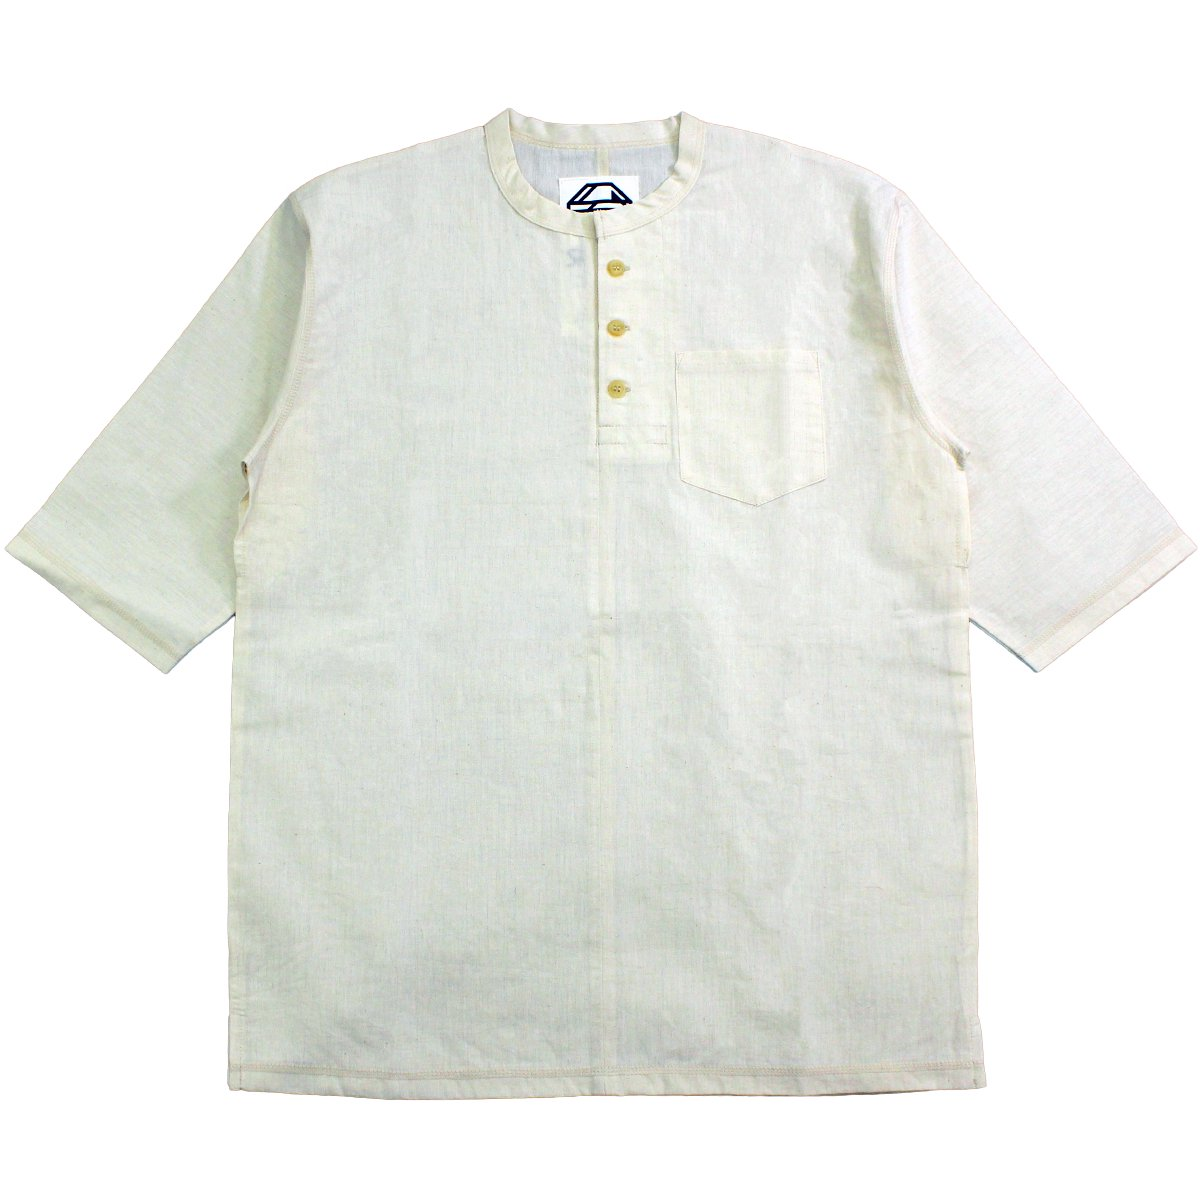 SANGOU 伊勢木綿Tシャツ 冠衣 KABURI シリーズ